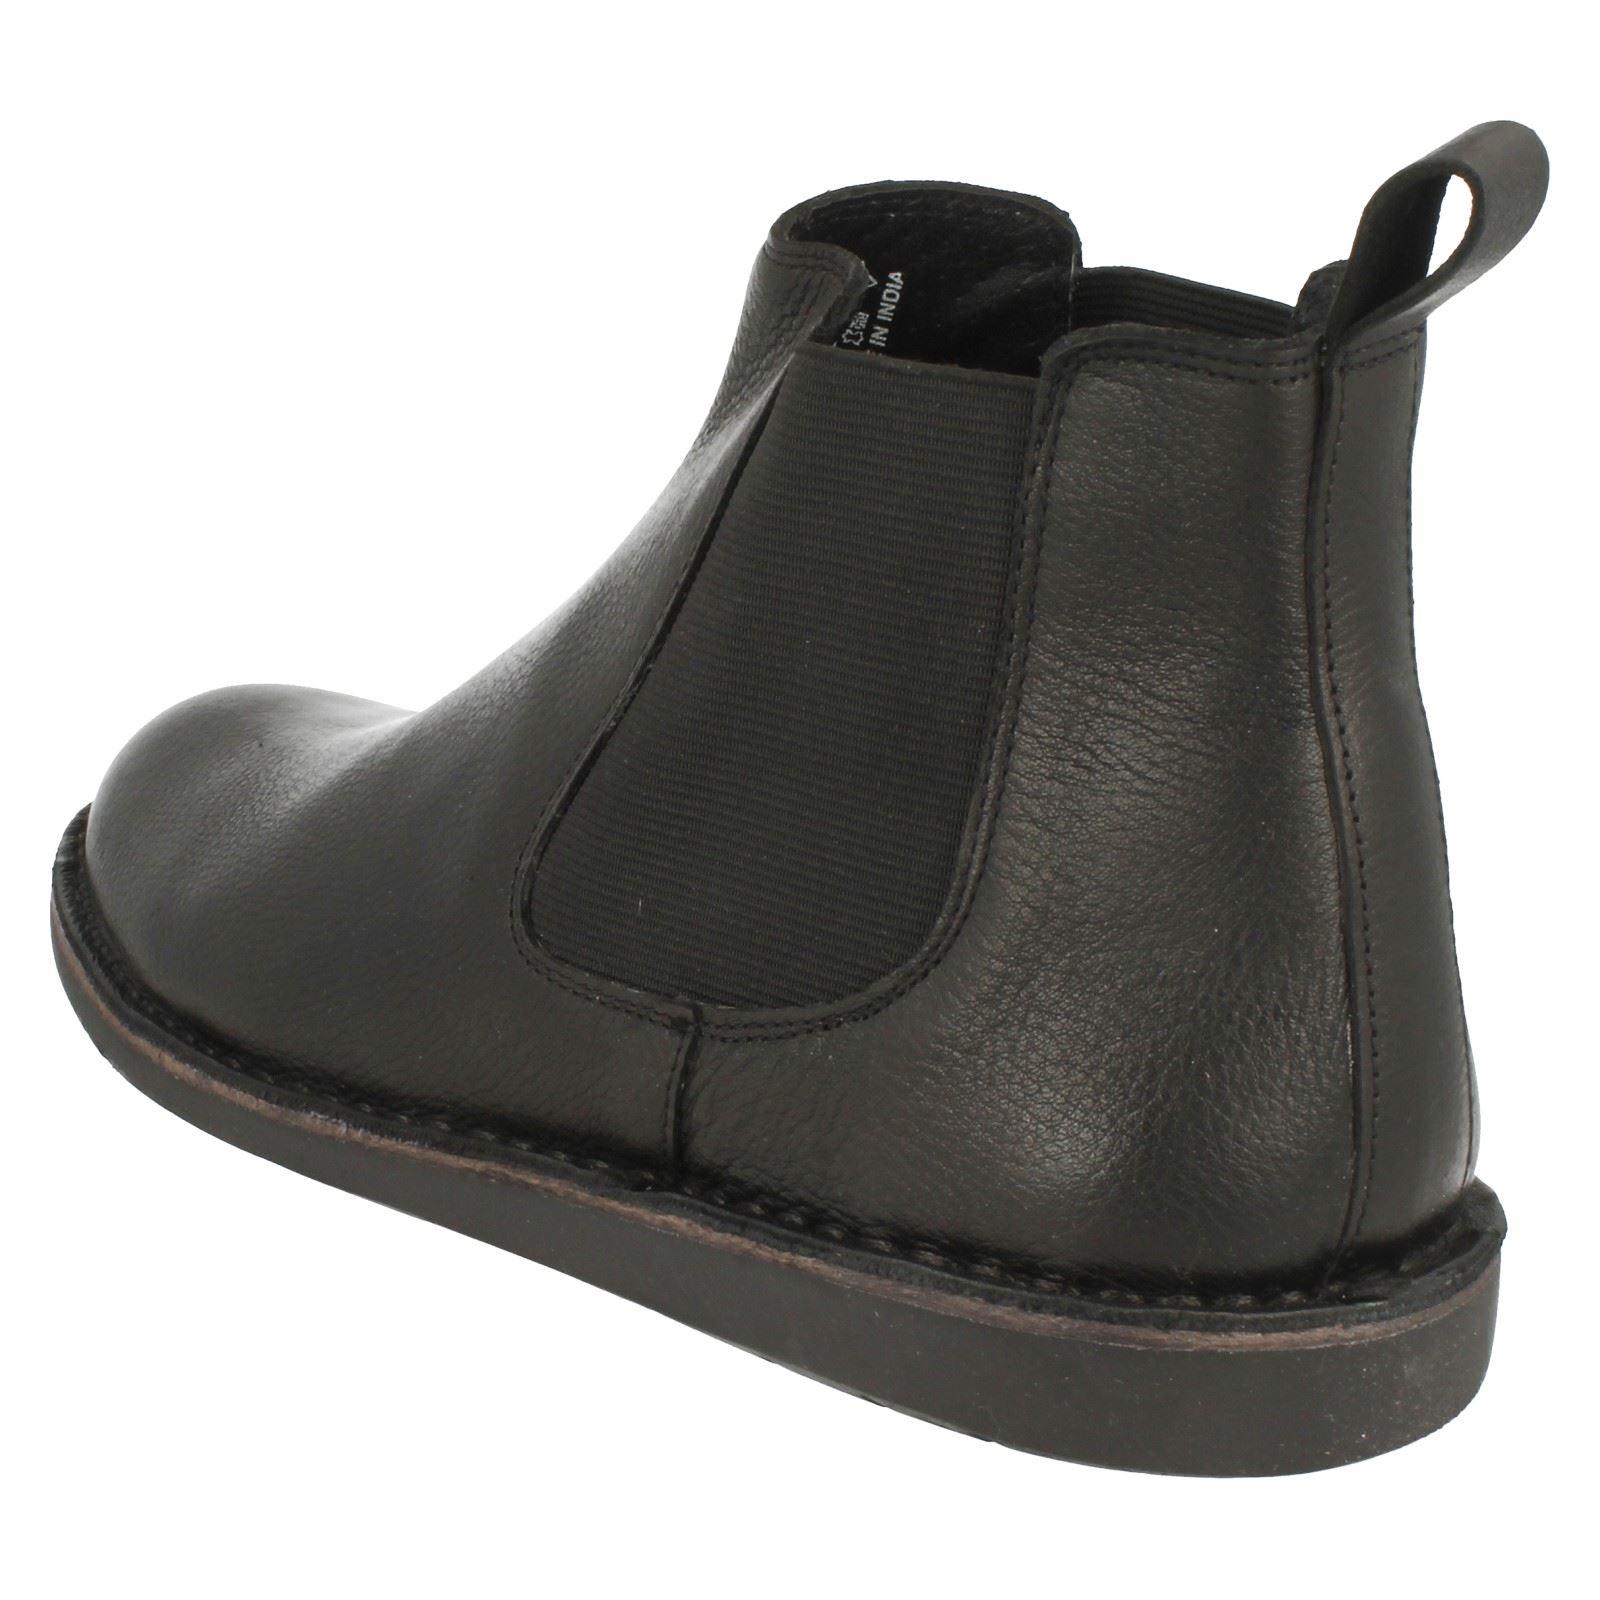 Mens-Padders-Pull-On-Chelsea-Boots-Jez thumbnail 4